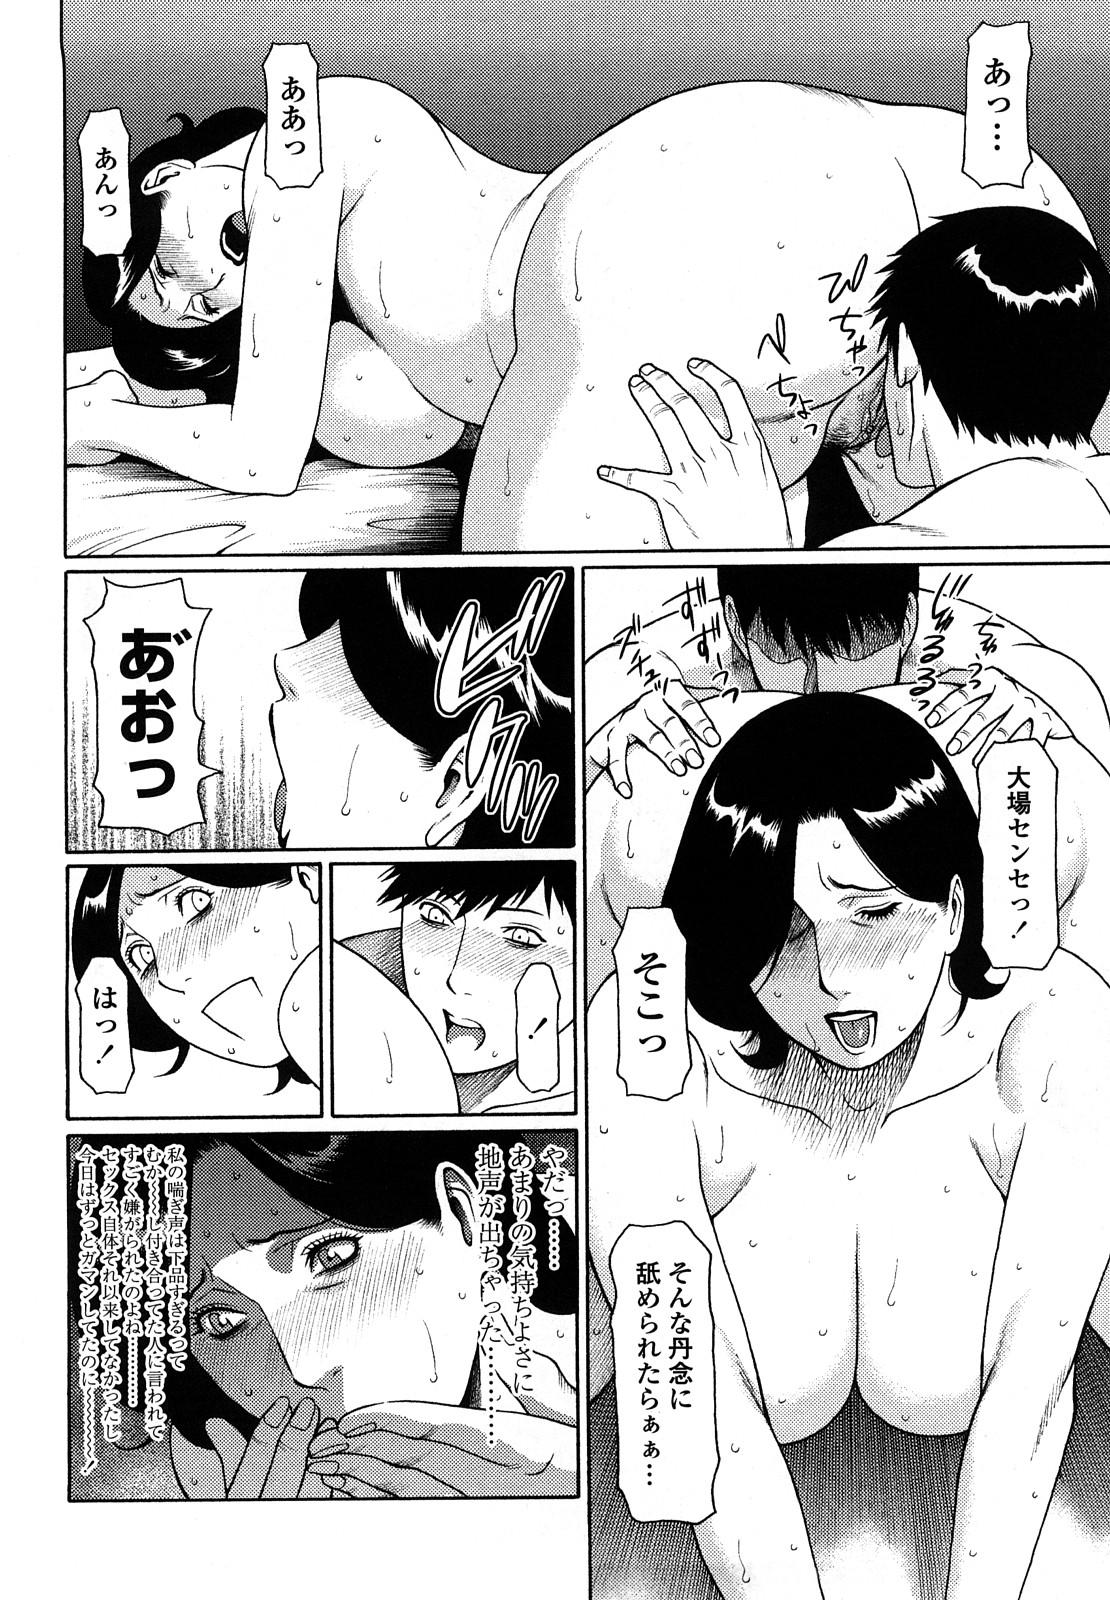 [Takasugi Kou] Kindan no Haha-Ana - Immorality Love-Hole [Decensored] 181